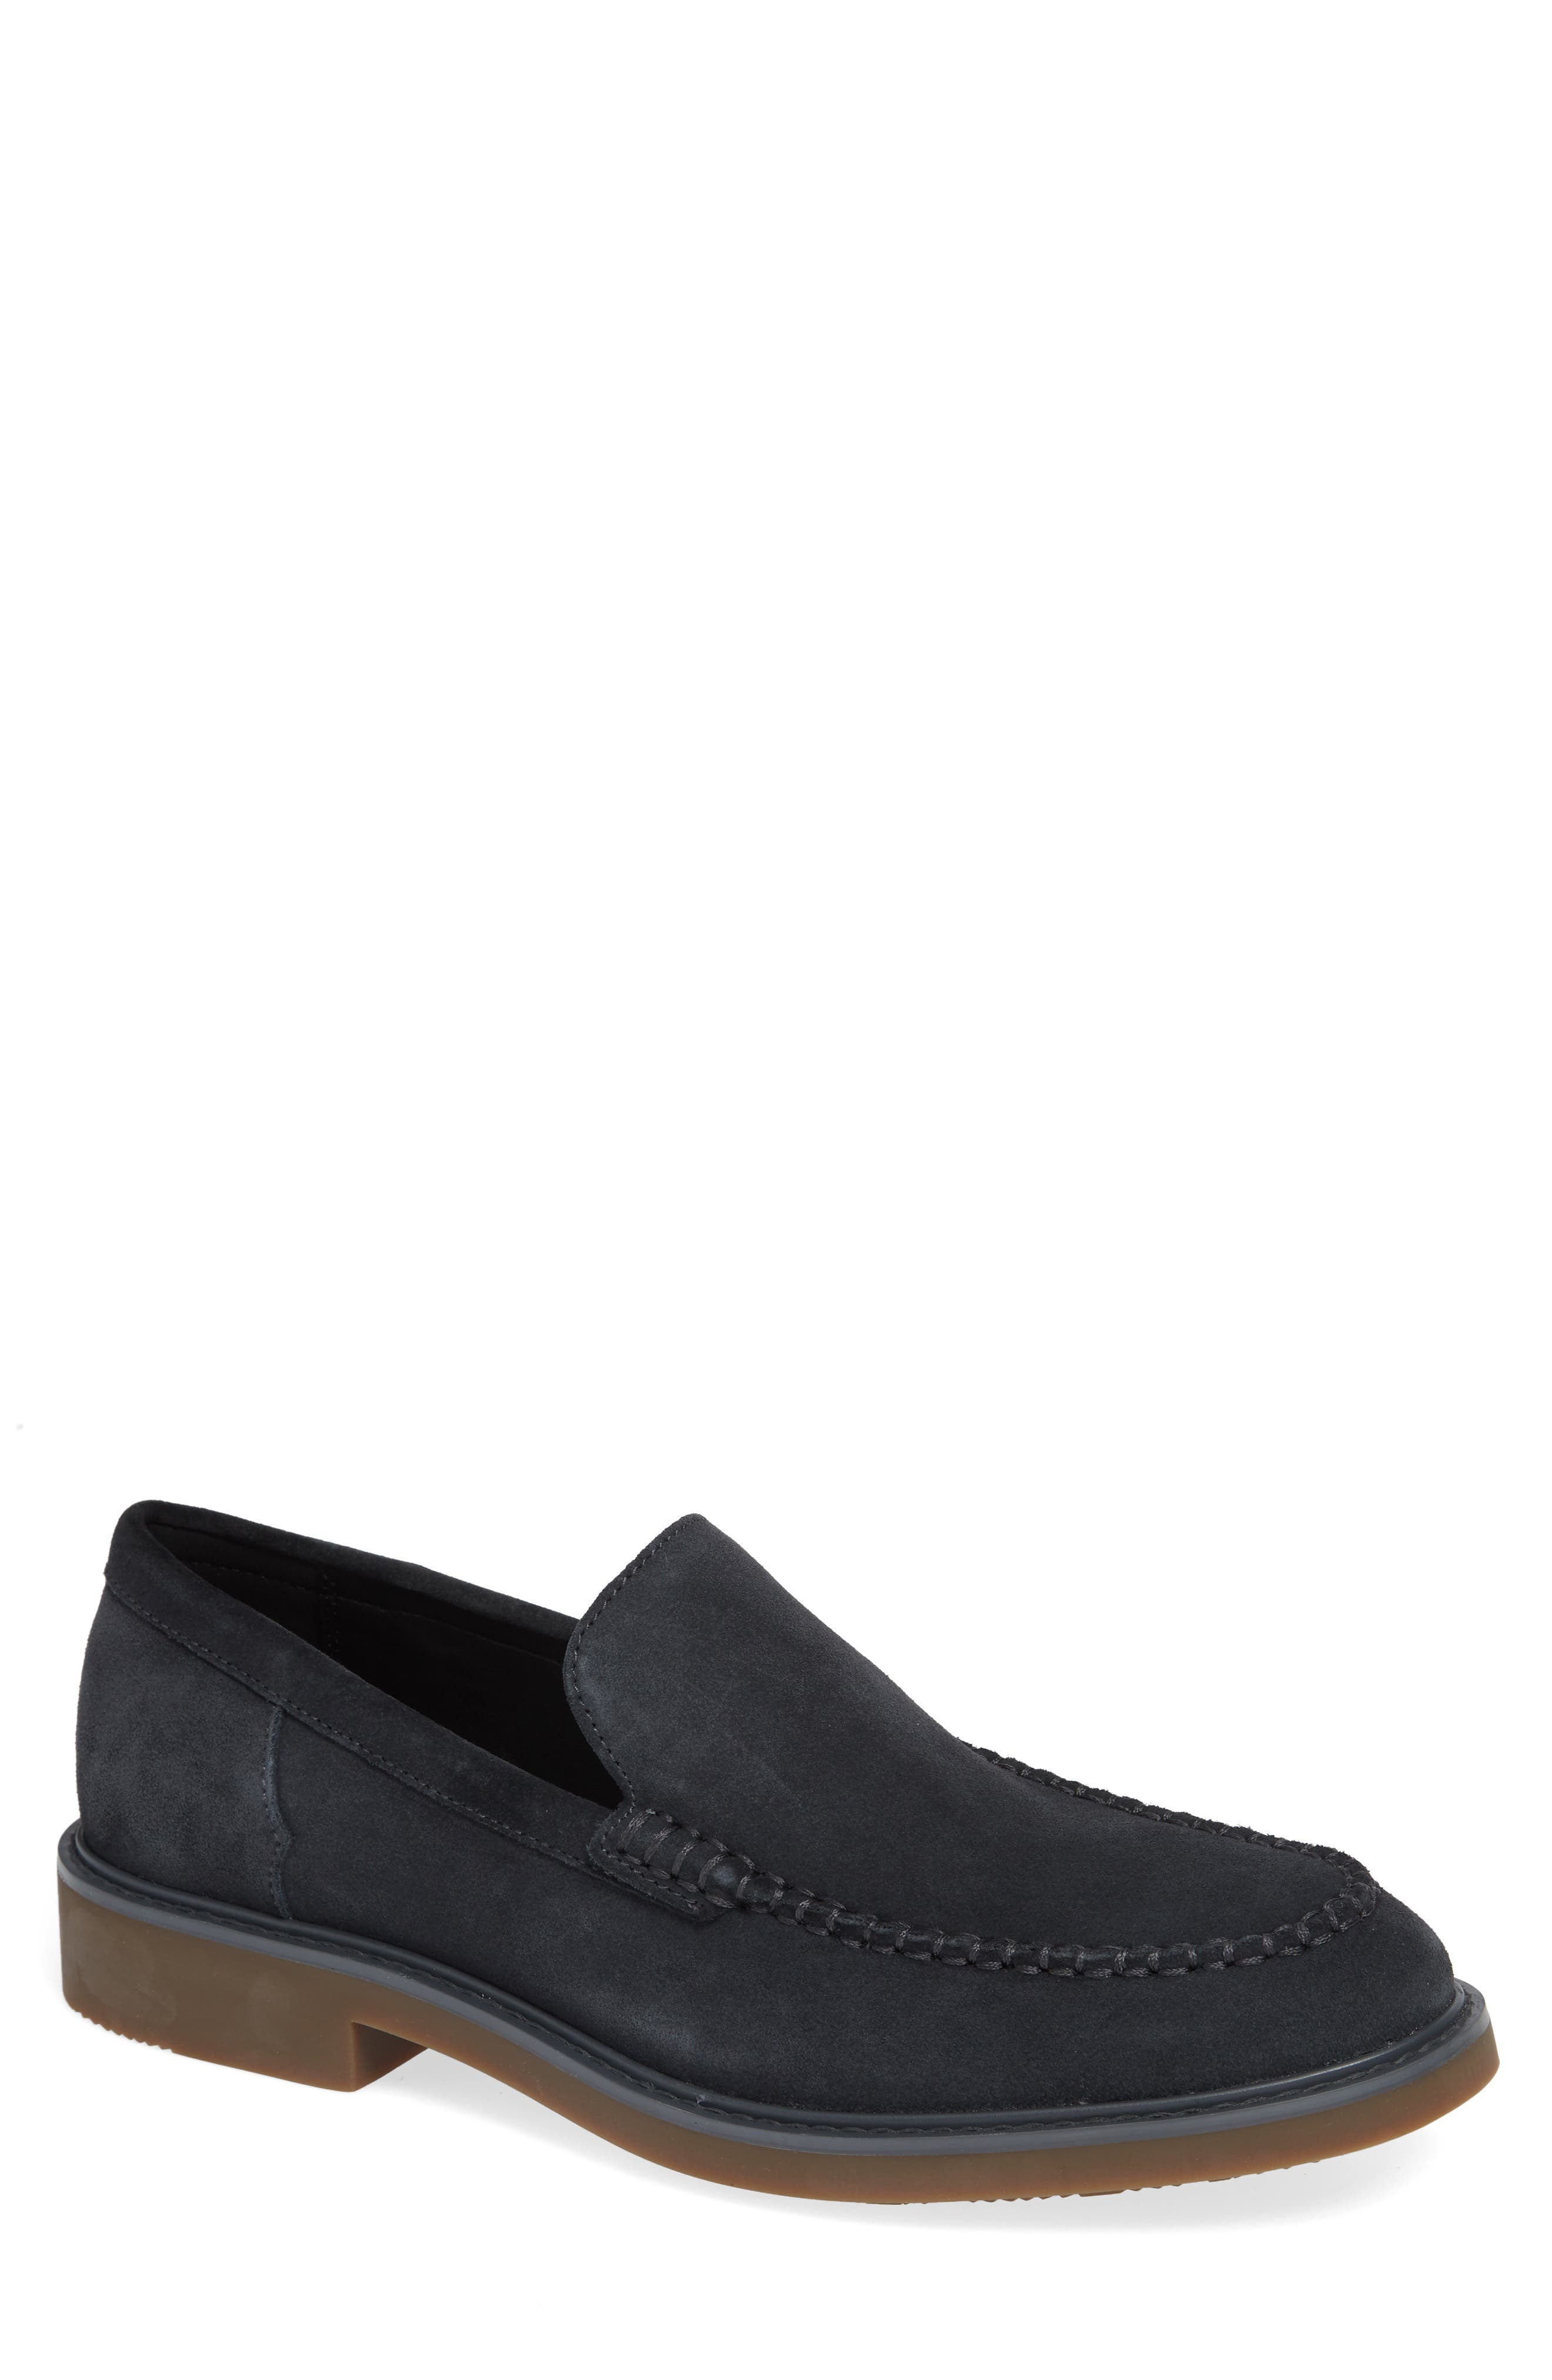 Calvin Klein Vance Apron Toe Loafer- Grey